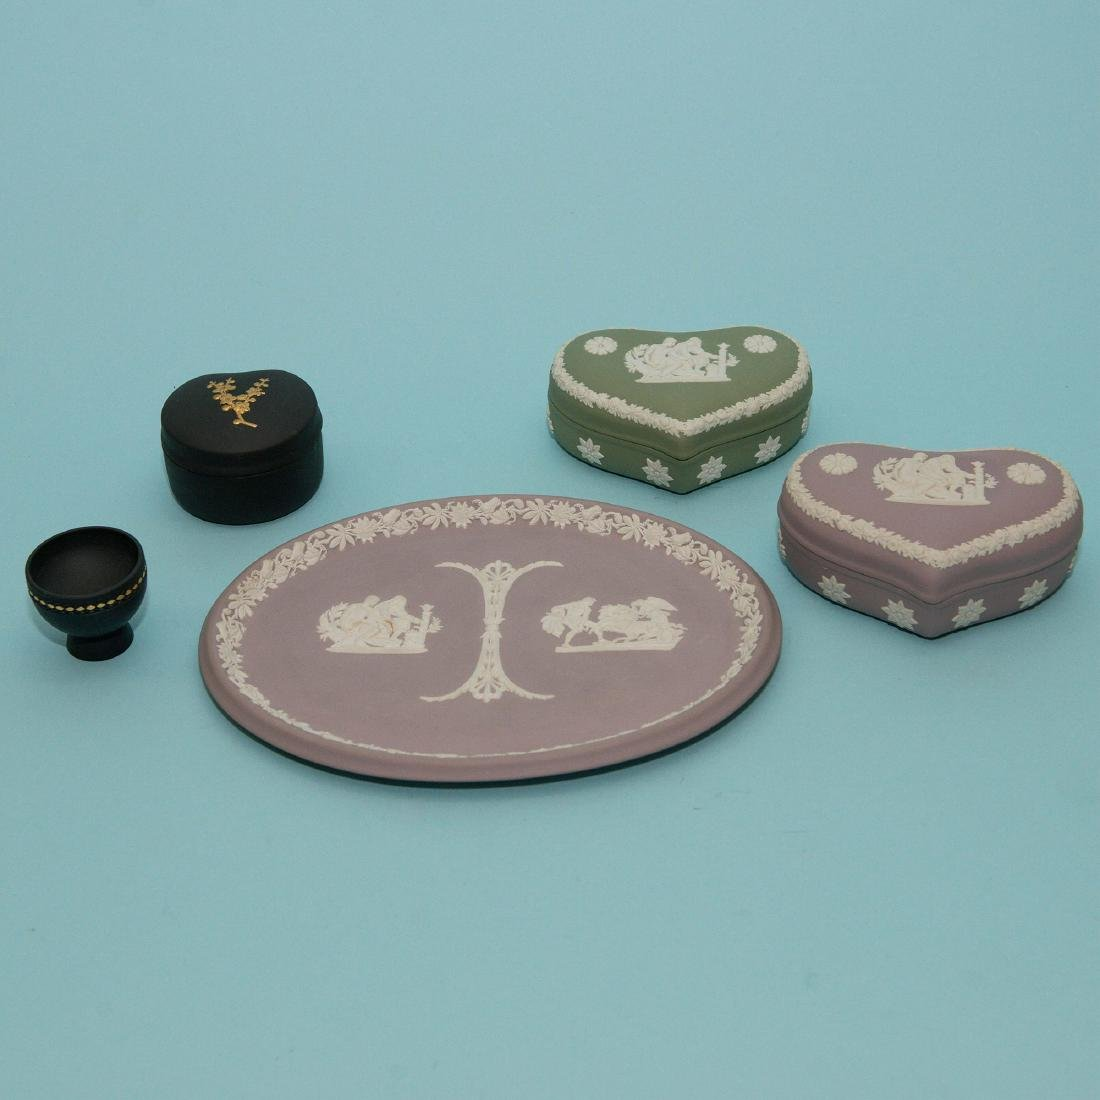 Wedgwood Jasperware 8 piece Collection